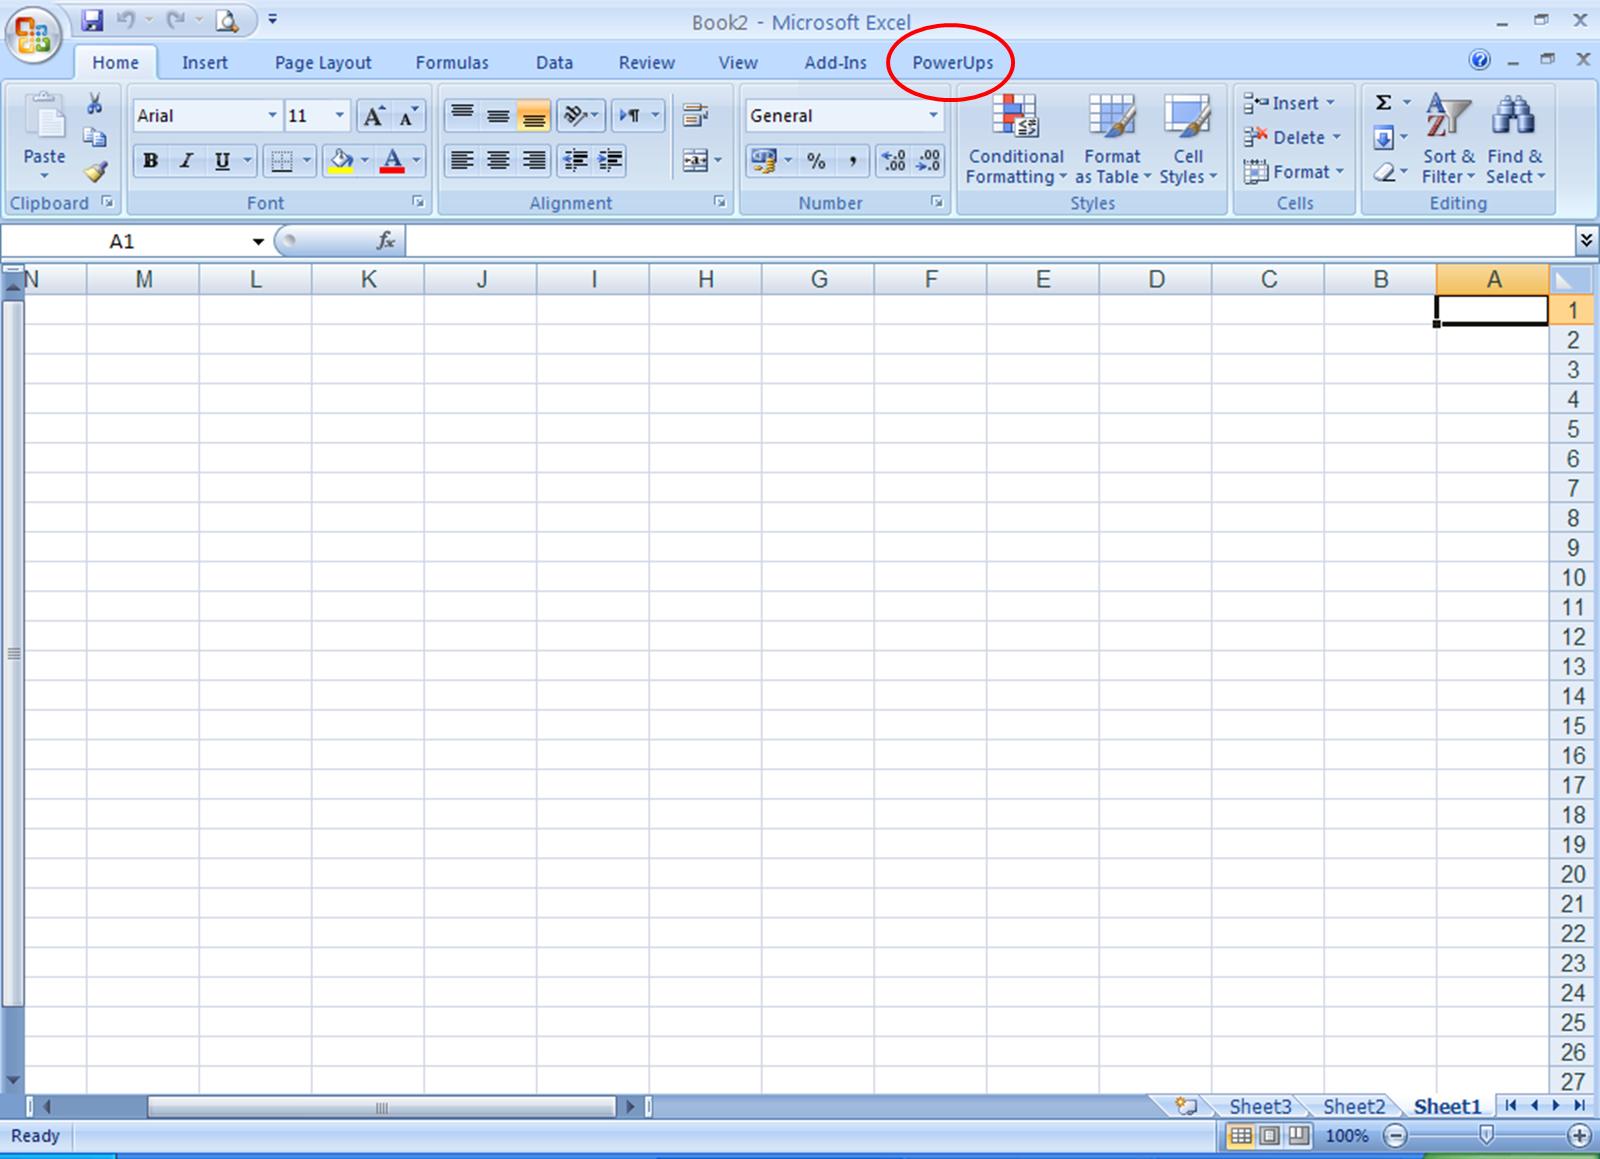 Excel PowerUps tool